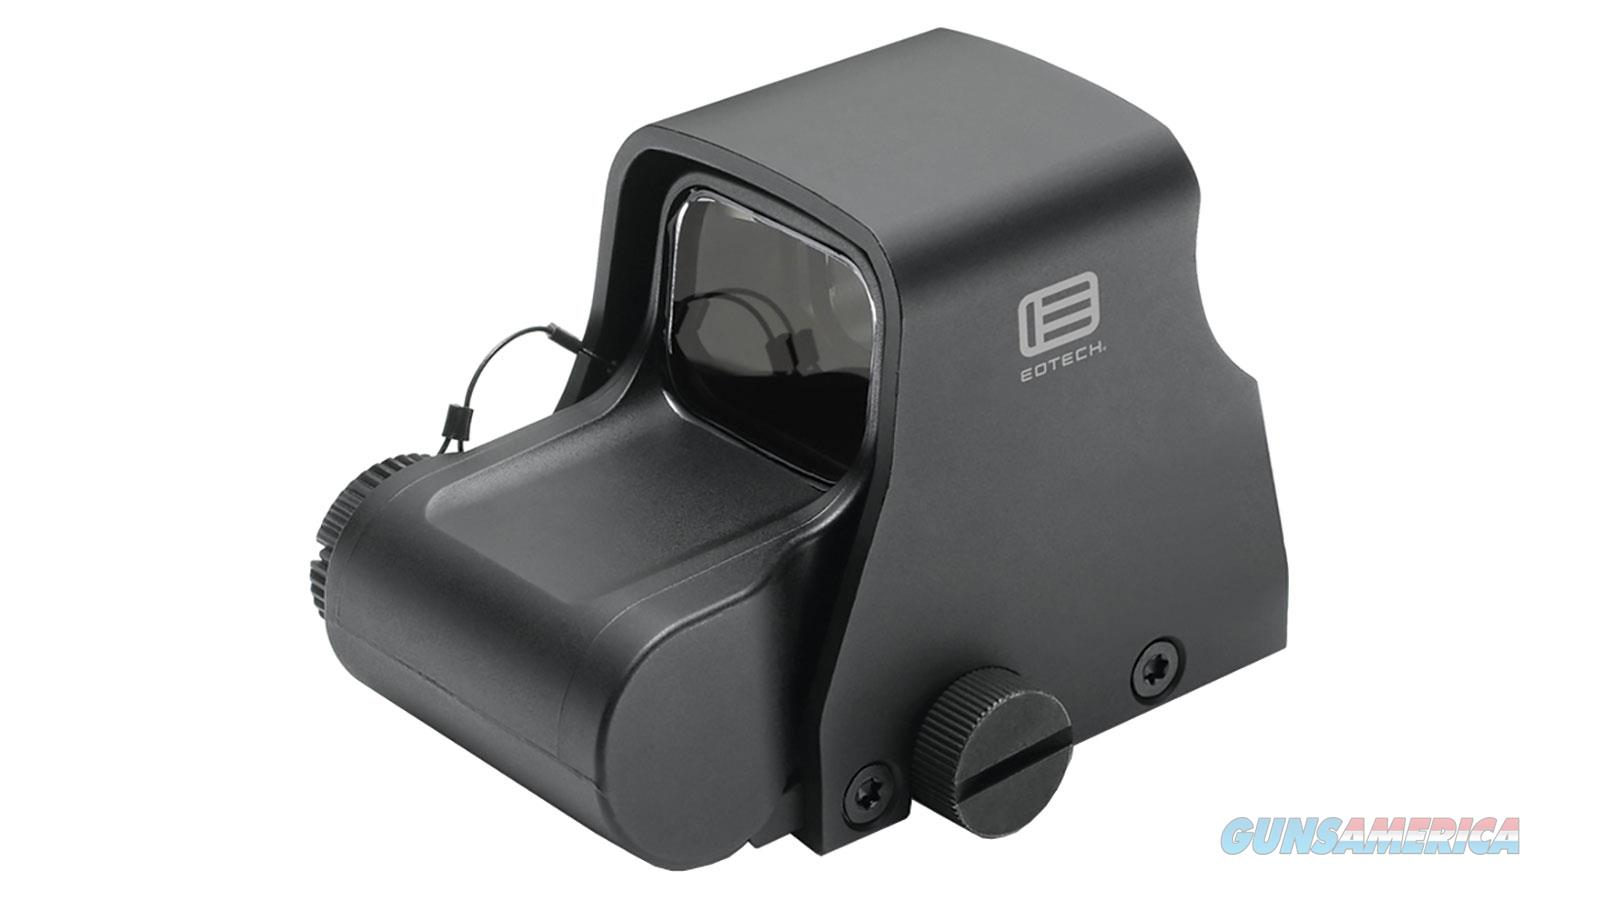 Eotech Xps 2-0 XPS2-0  Non-Guns > Iron/Metal/Peep Sights